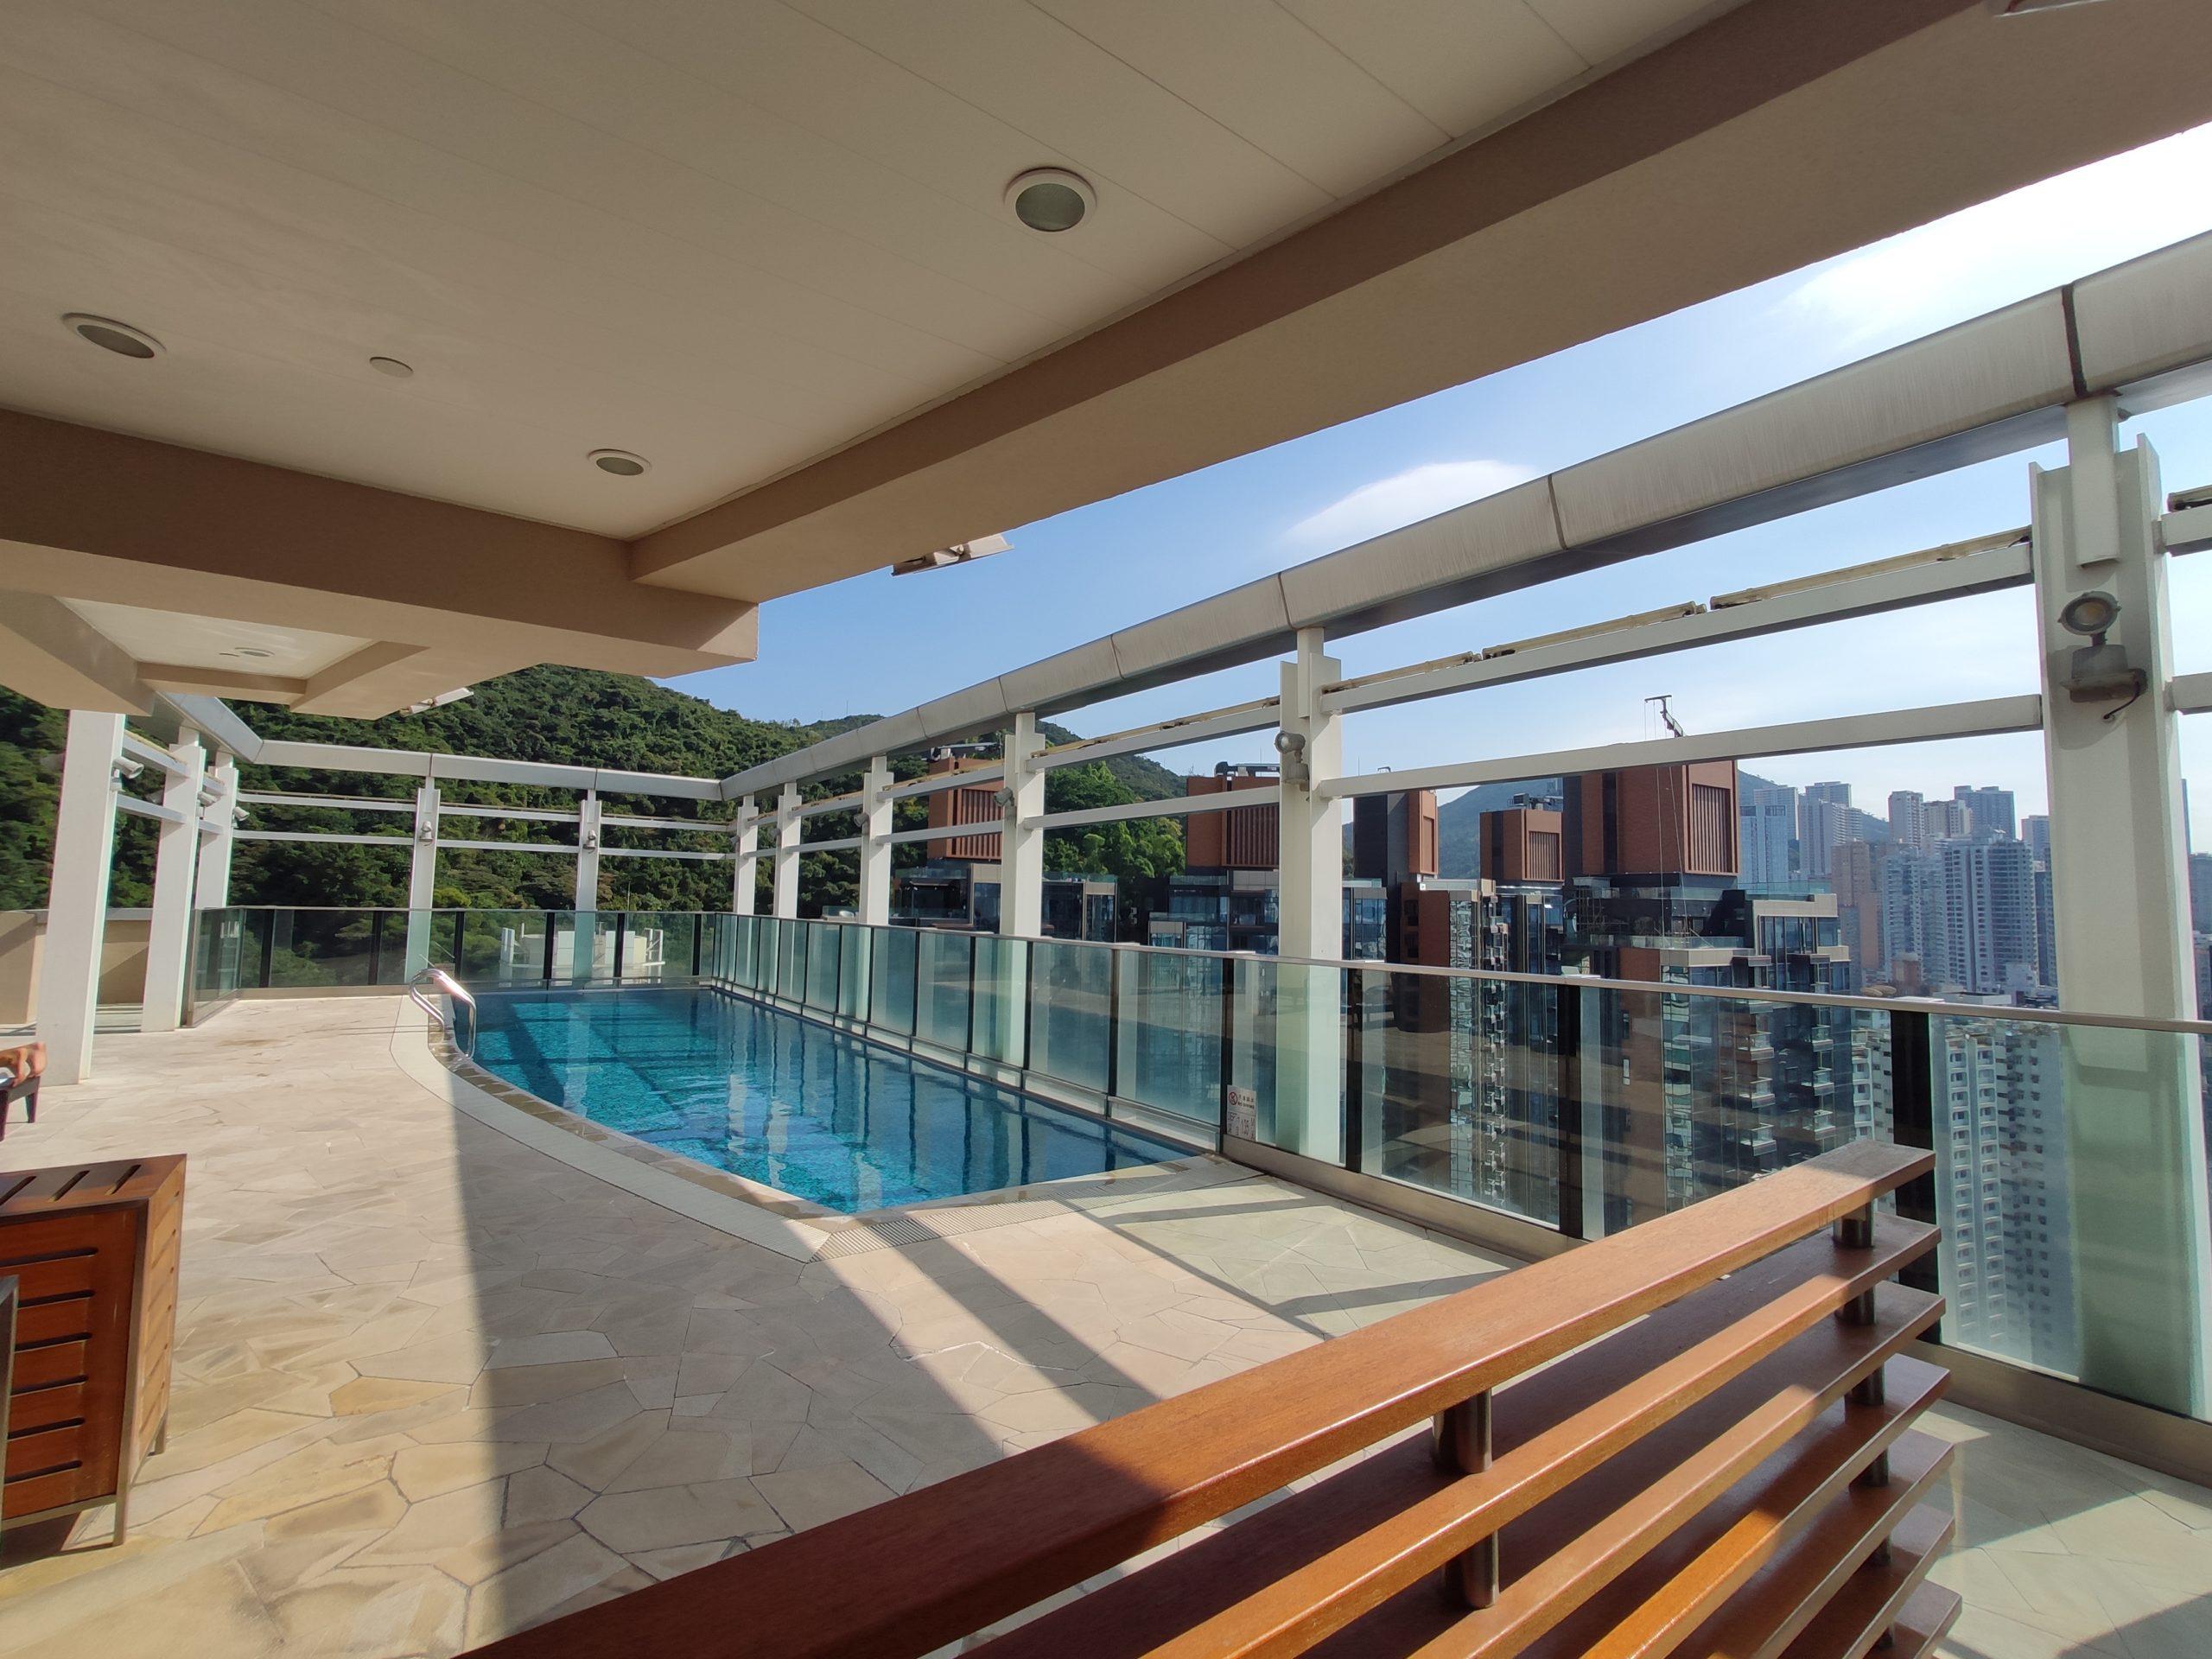 L'hotel Causeway Bay: Rooftop Swimming Pool